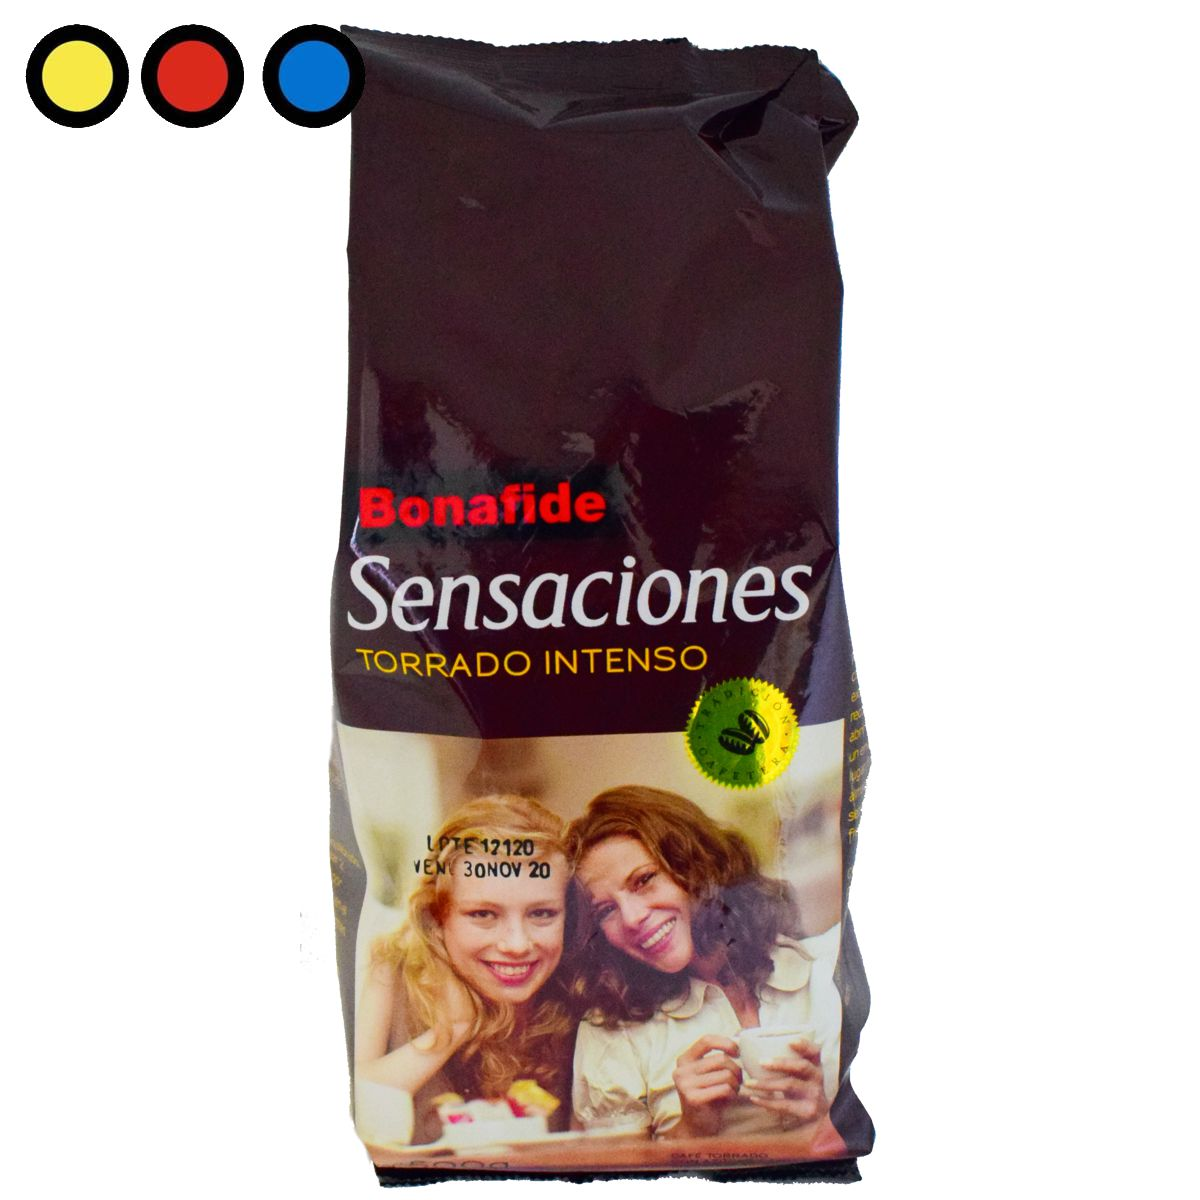 cafe bonafide sensaciones intenso 500 precios